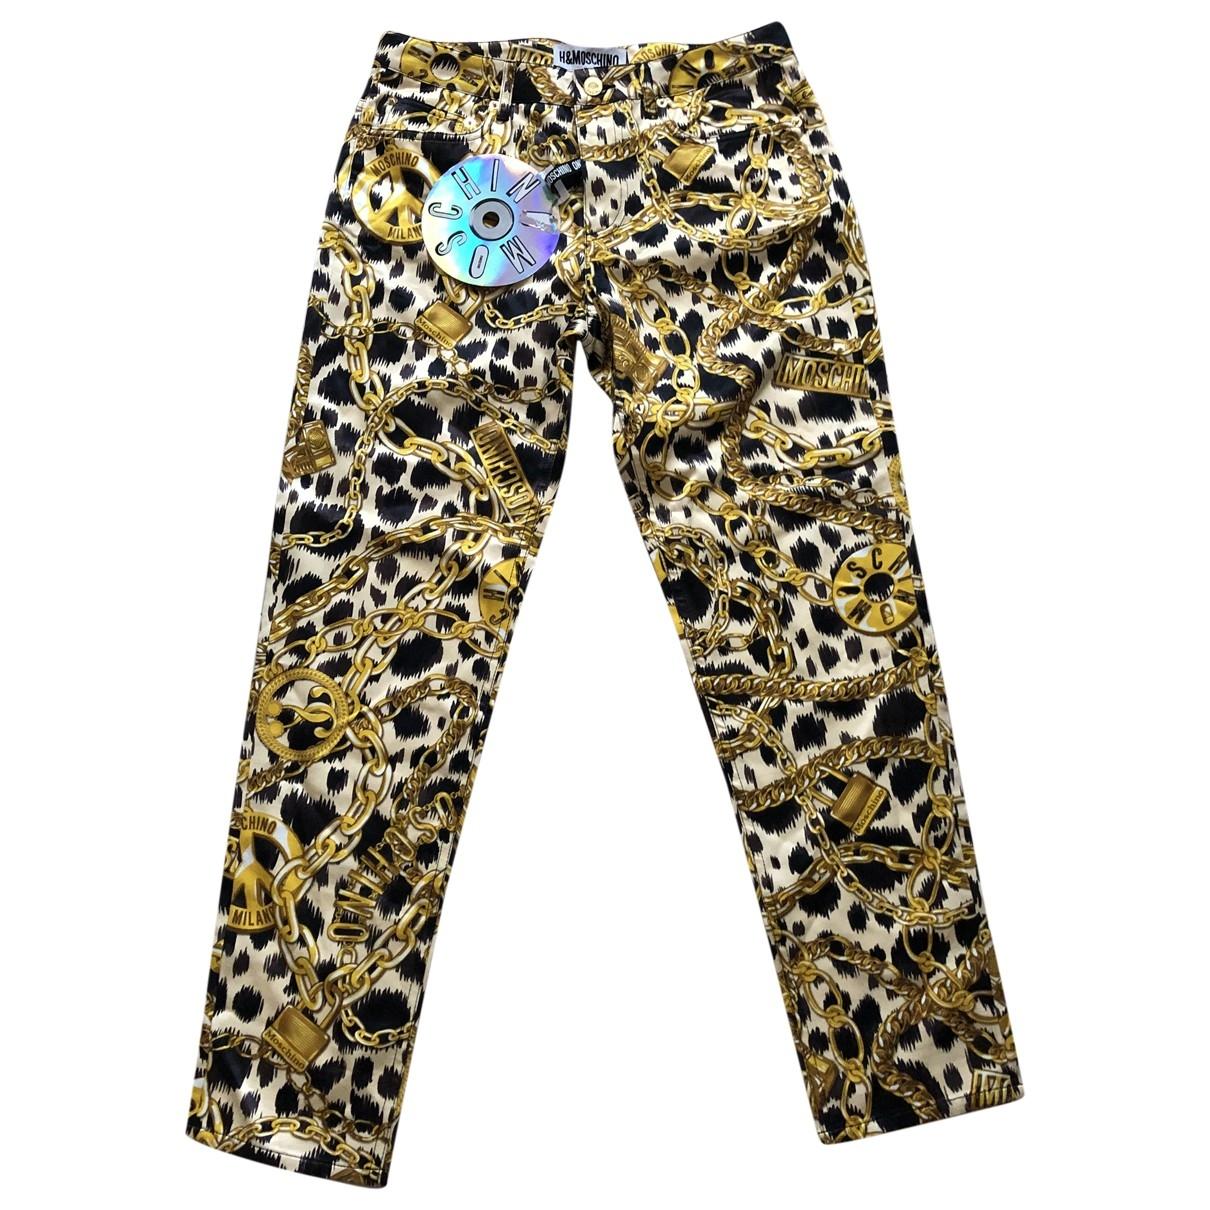 Pantalon pitillo Moschino For H&m